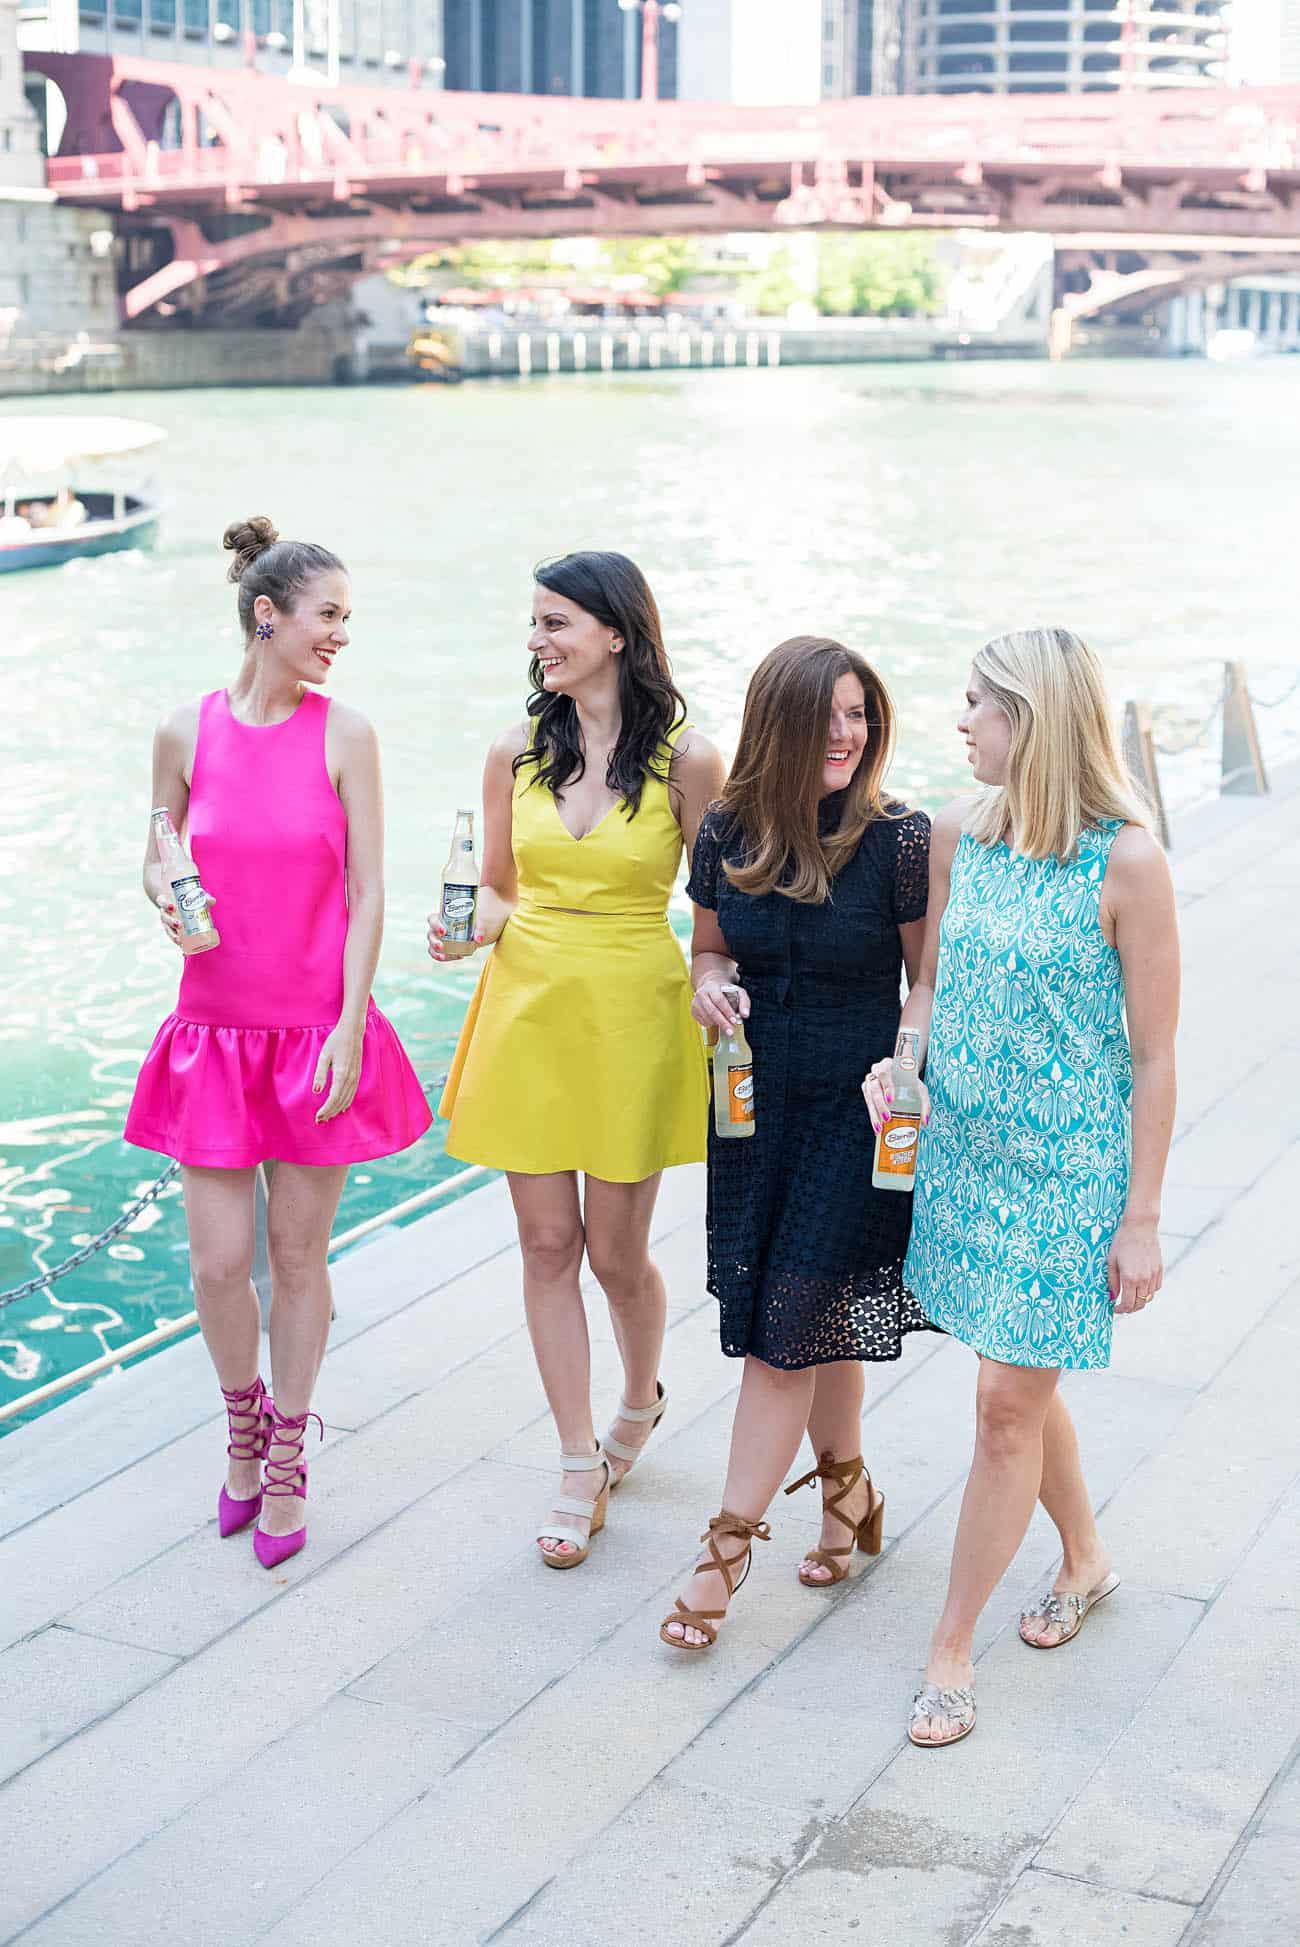 Barritt's Ginger Beer, Chicago Fashion Blogger, Ginger Beer, A Lily Love Affair, Chicago River Walk